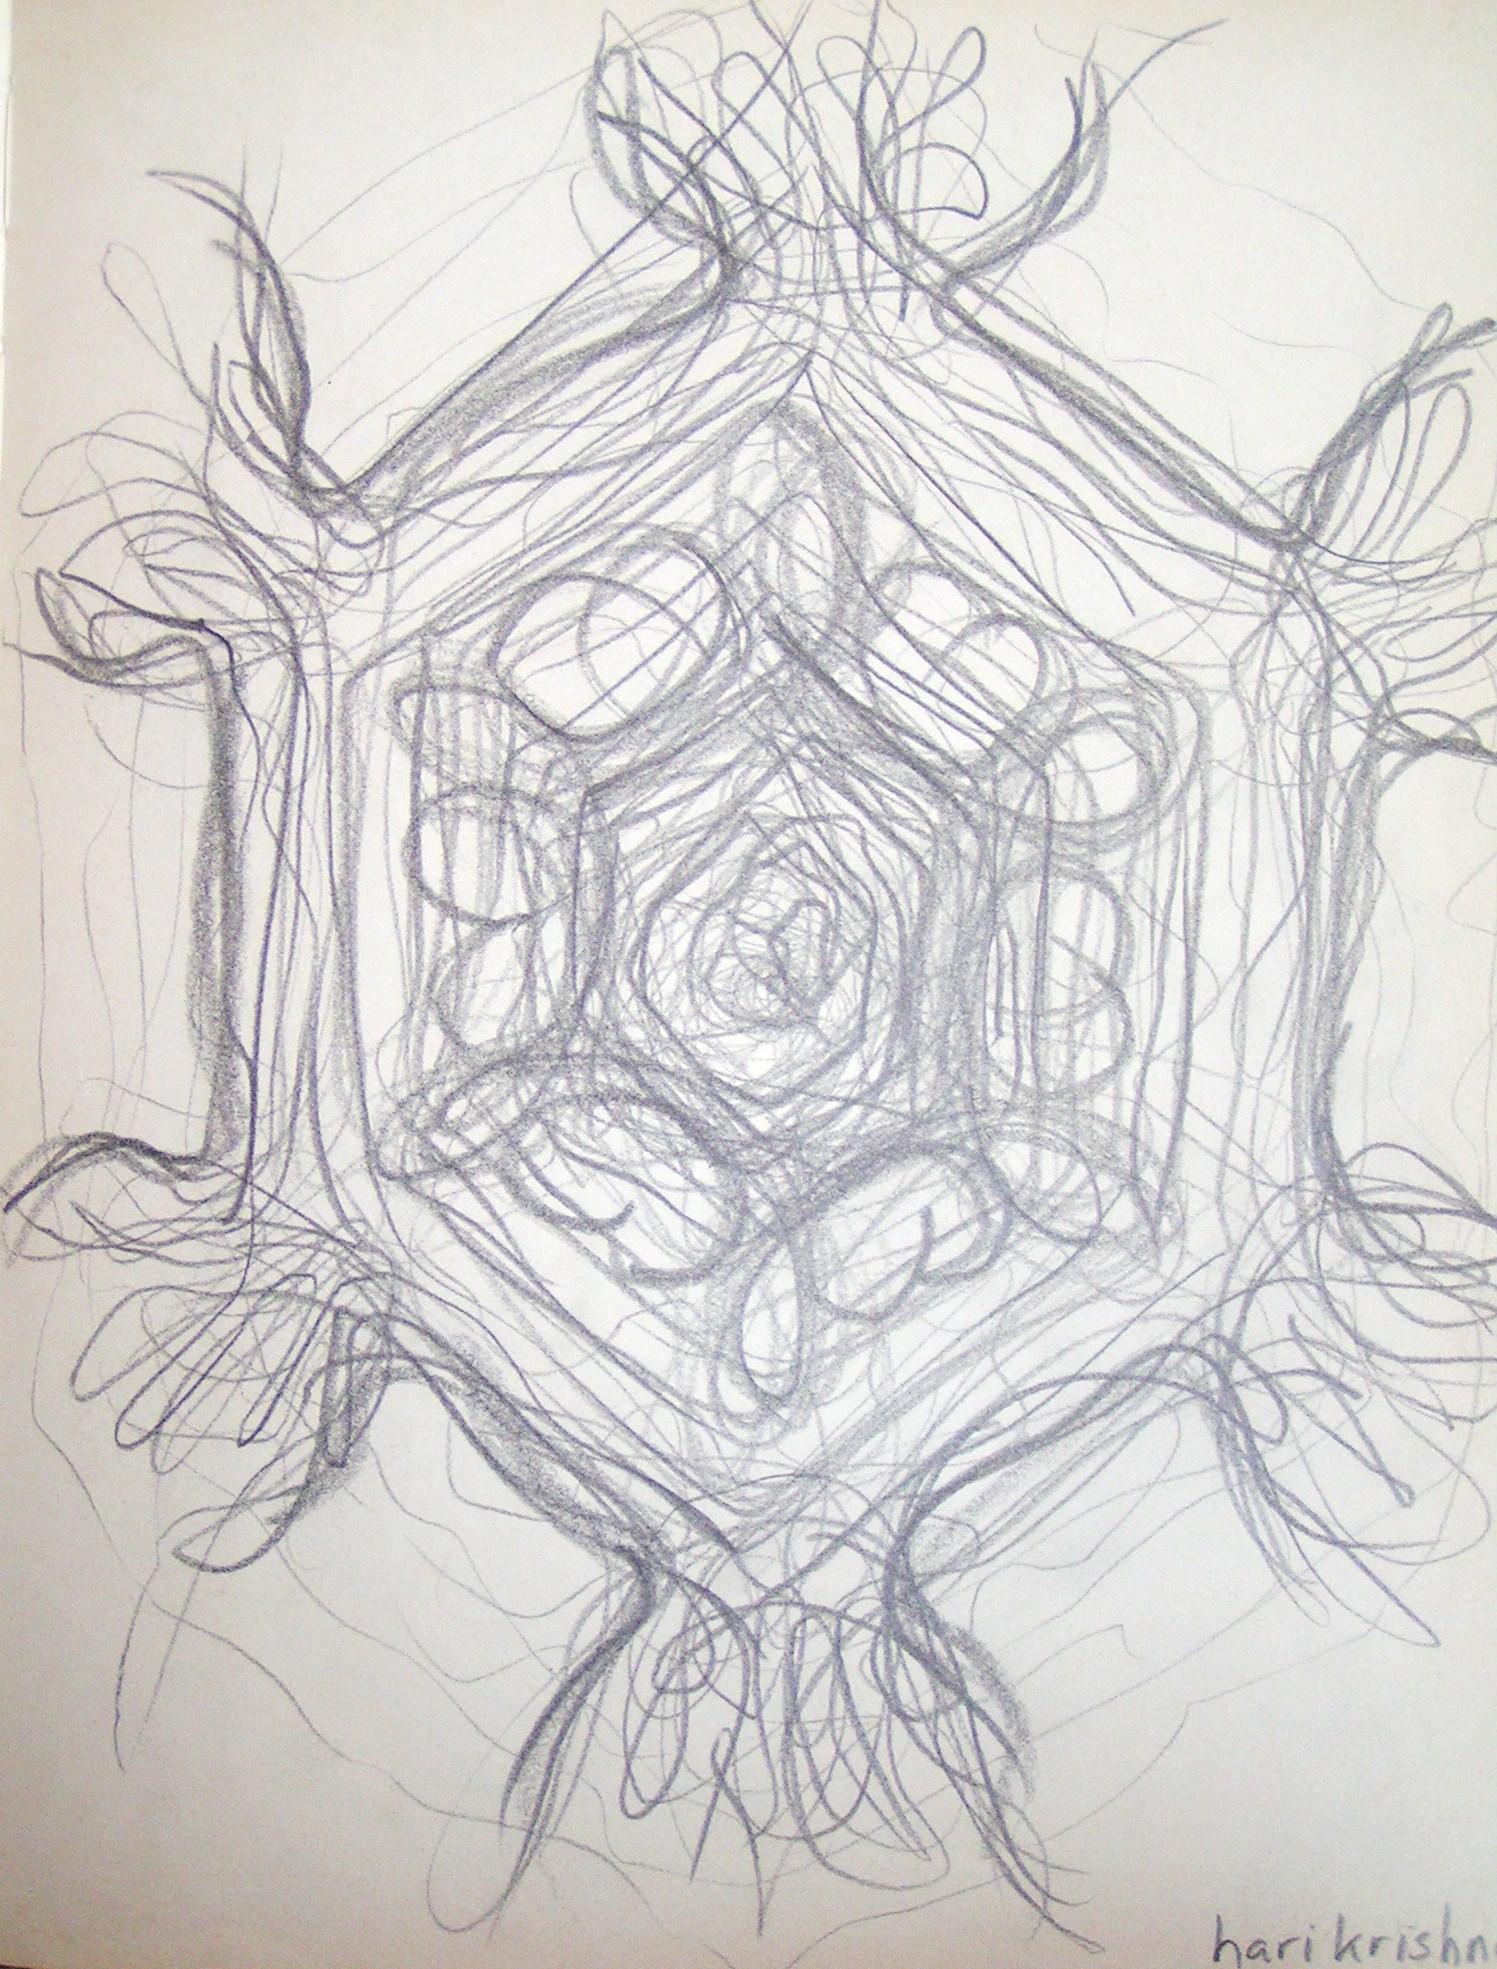 tekening op muziek -Govinda adi purusam- van Atmara Das